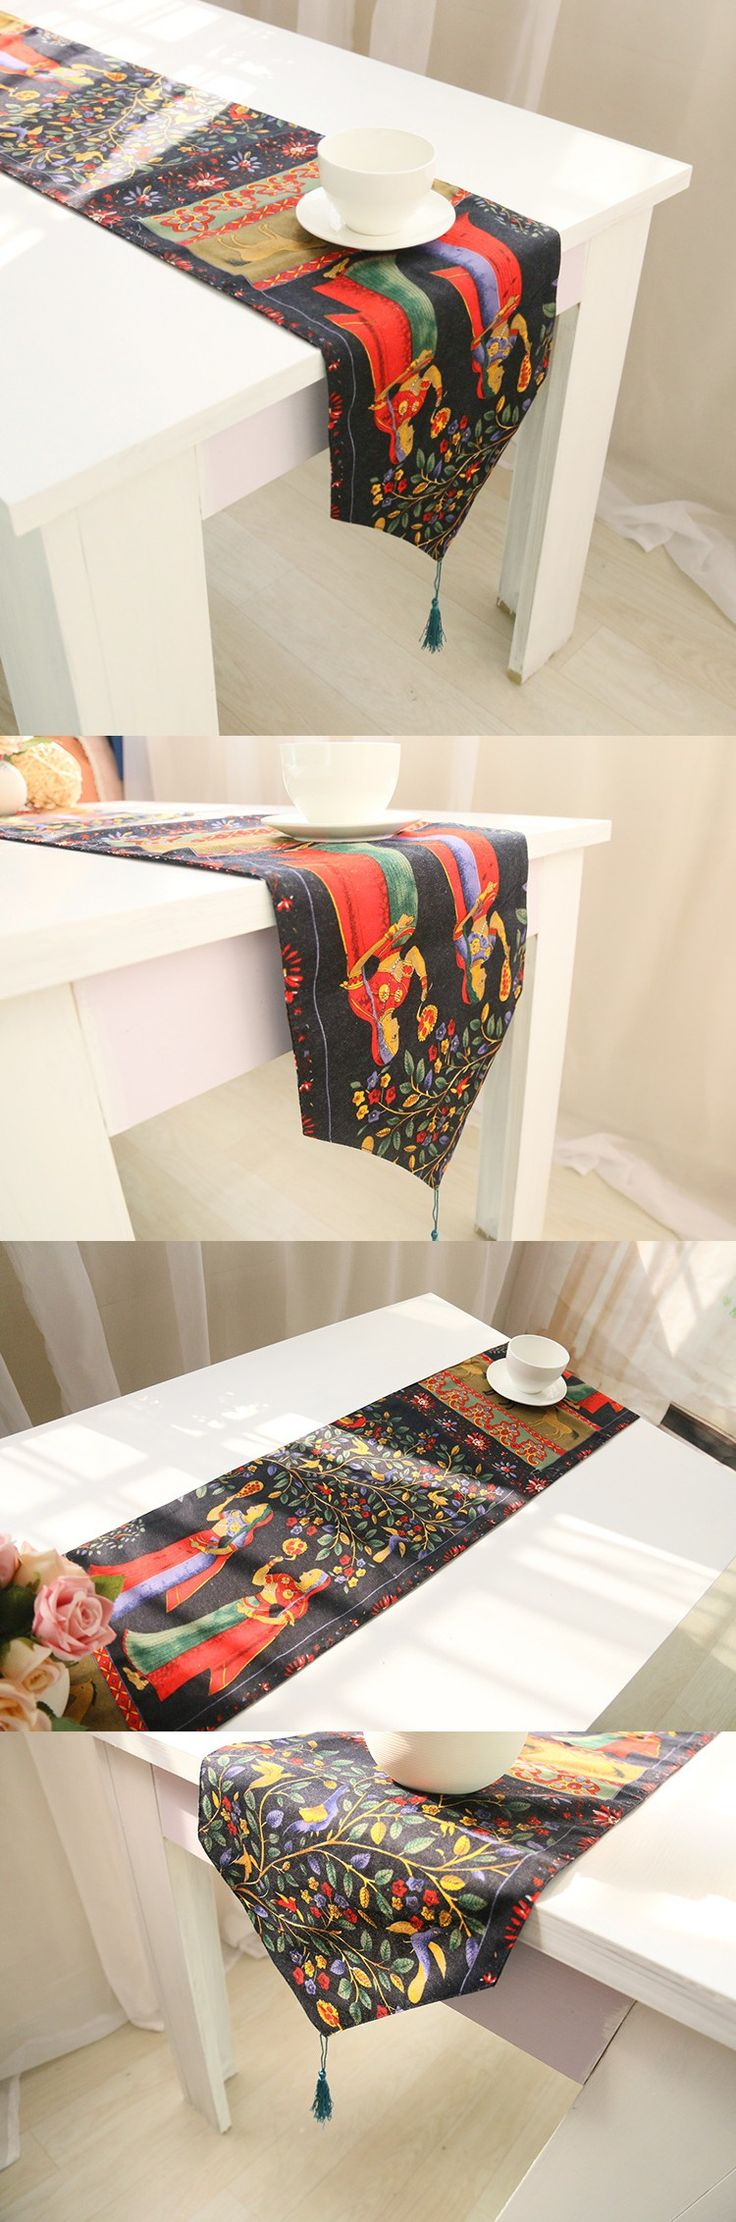 Decoracion Mesa Boda Vintage Ramie Cotton Decorative Handmade Home Asian Table Runners $13.87